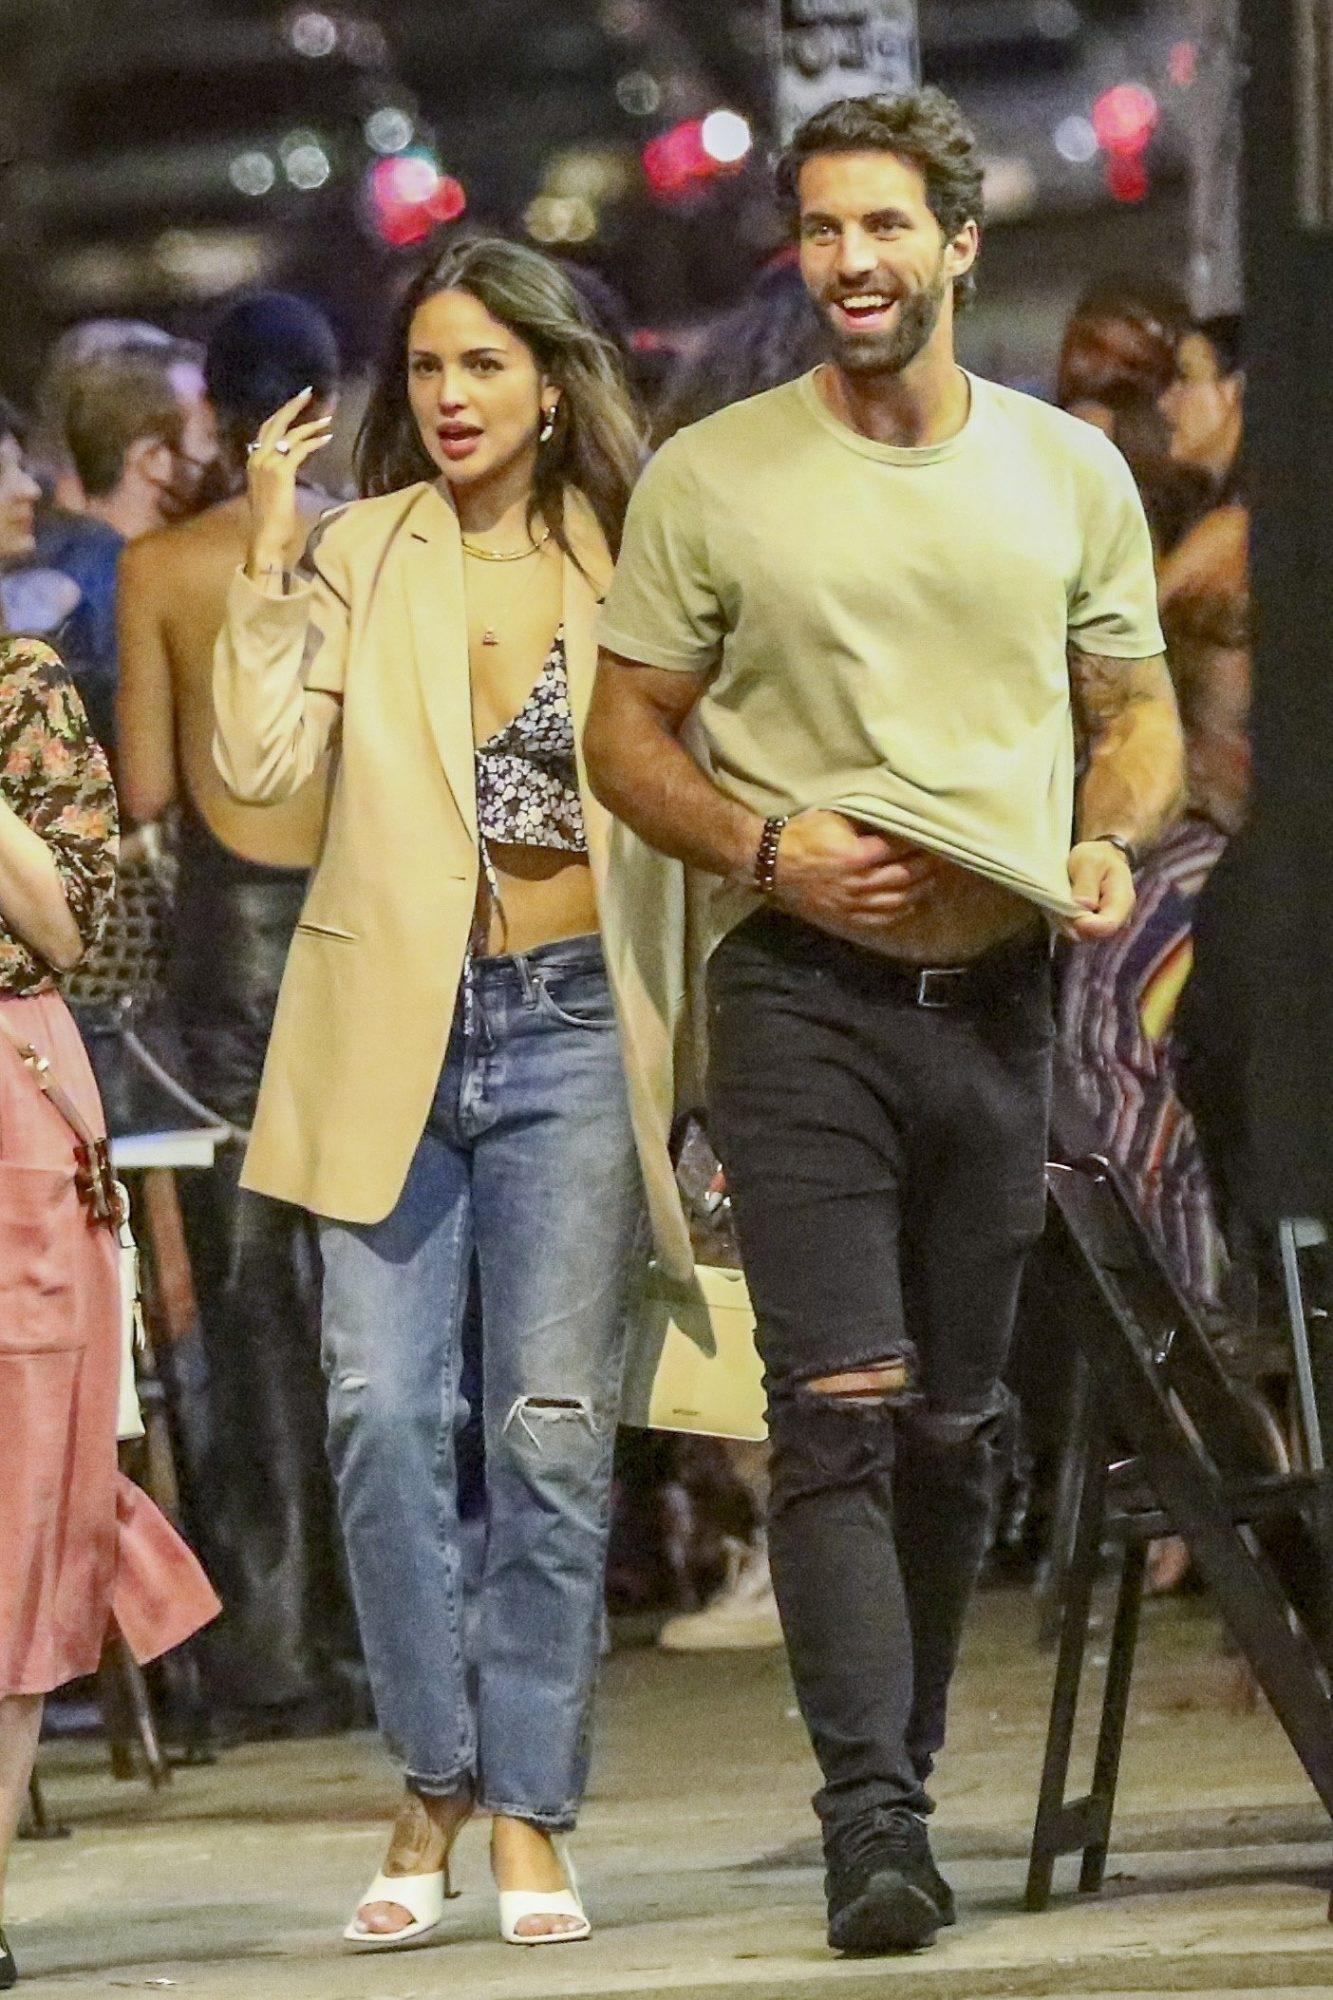 Eiza Gonzalez Spends the Night Partying with Boyfriend Paul Rabilmpleted